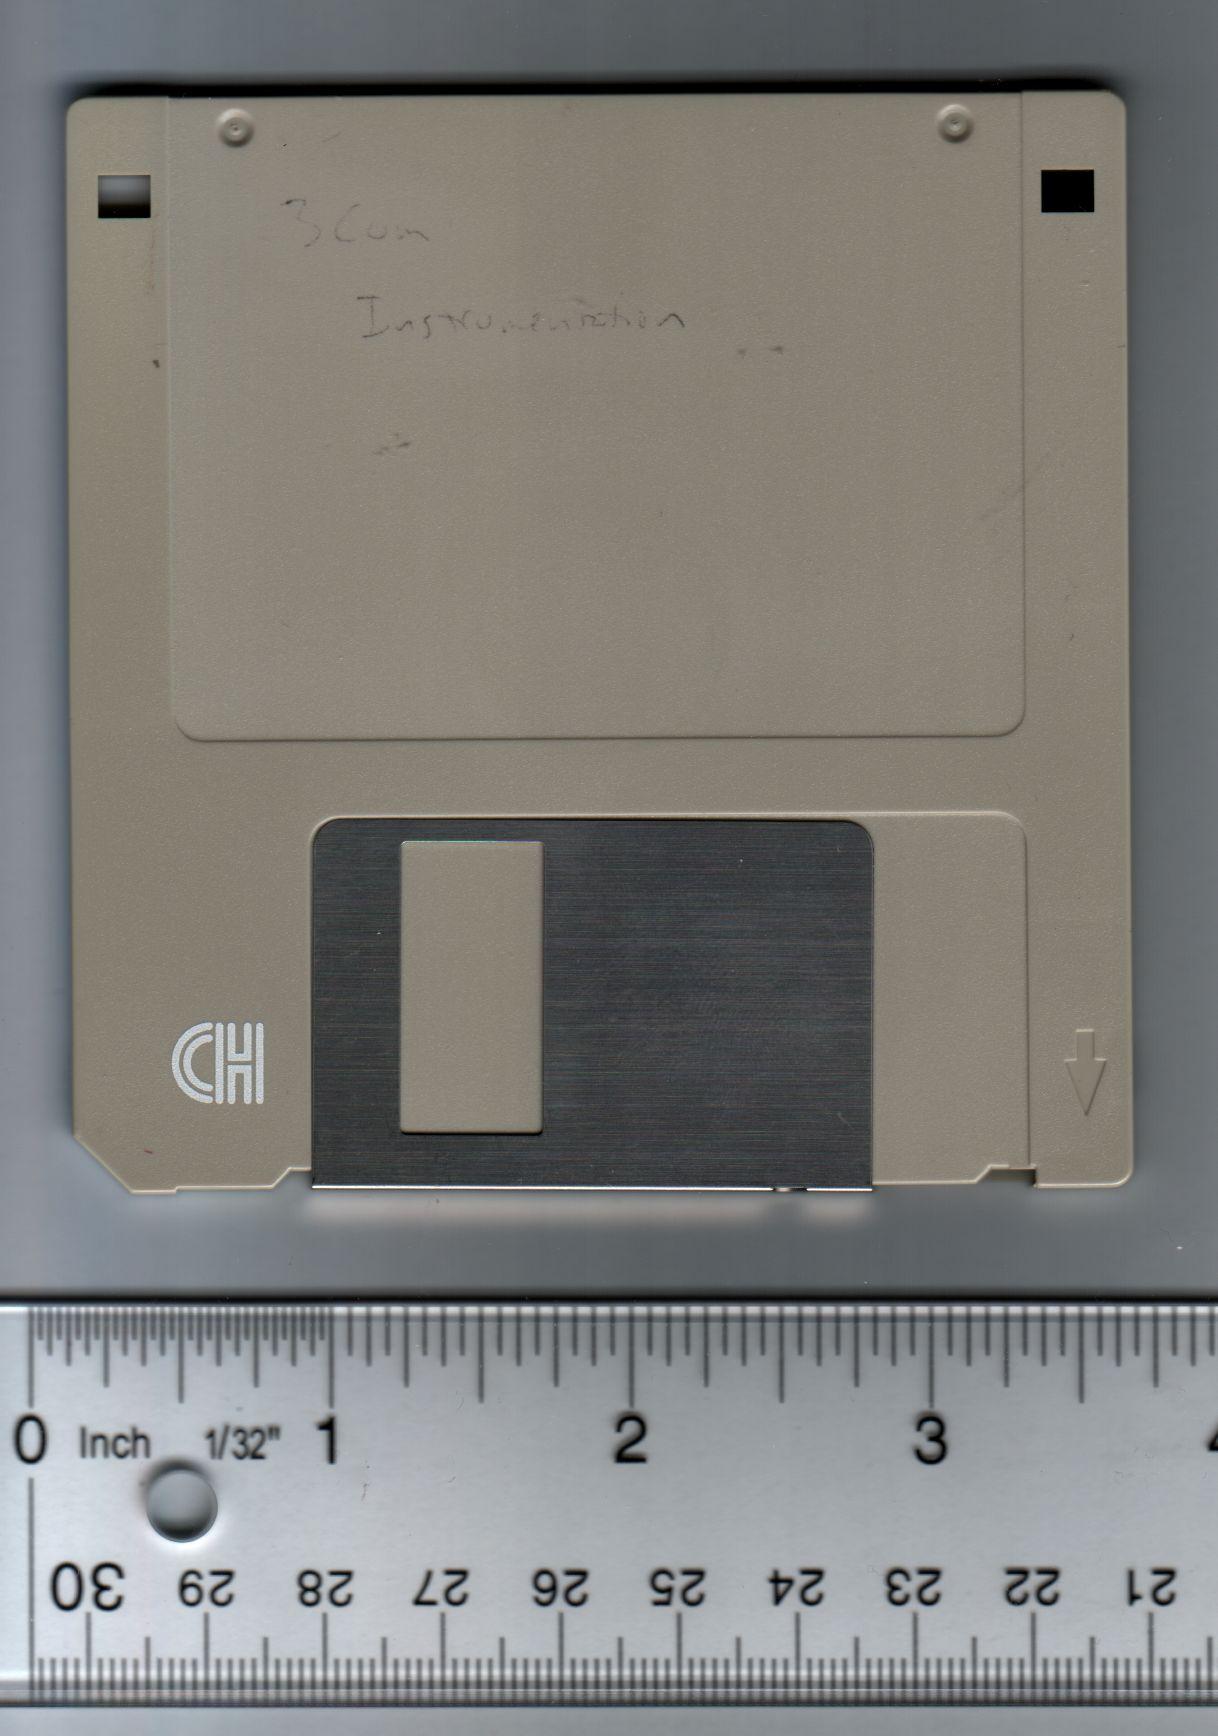 35 Inch Floppy Disk